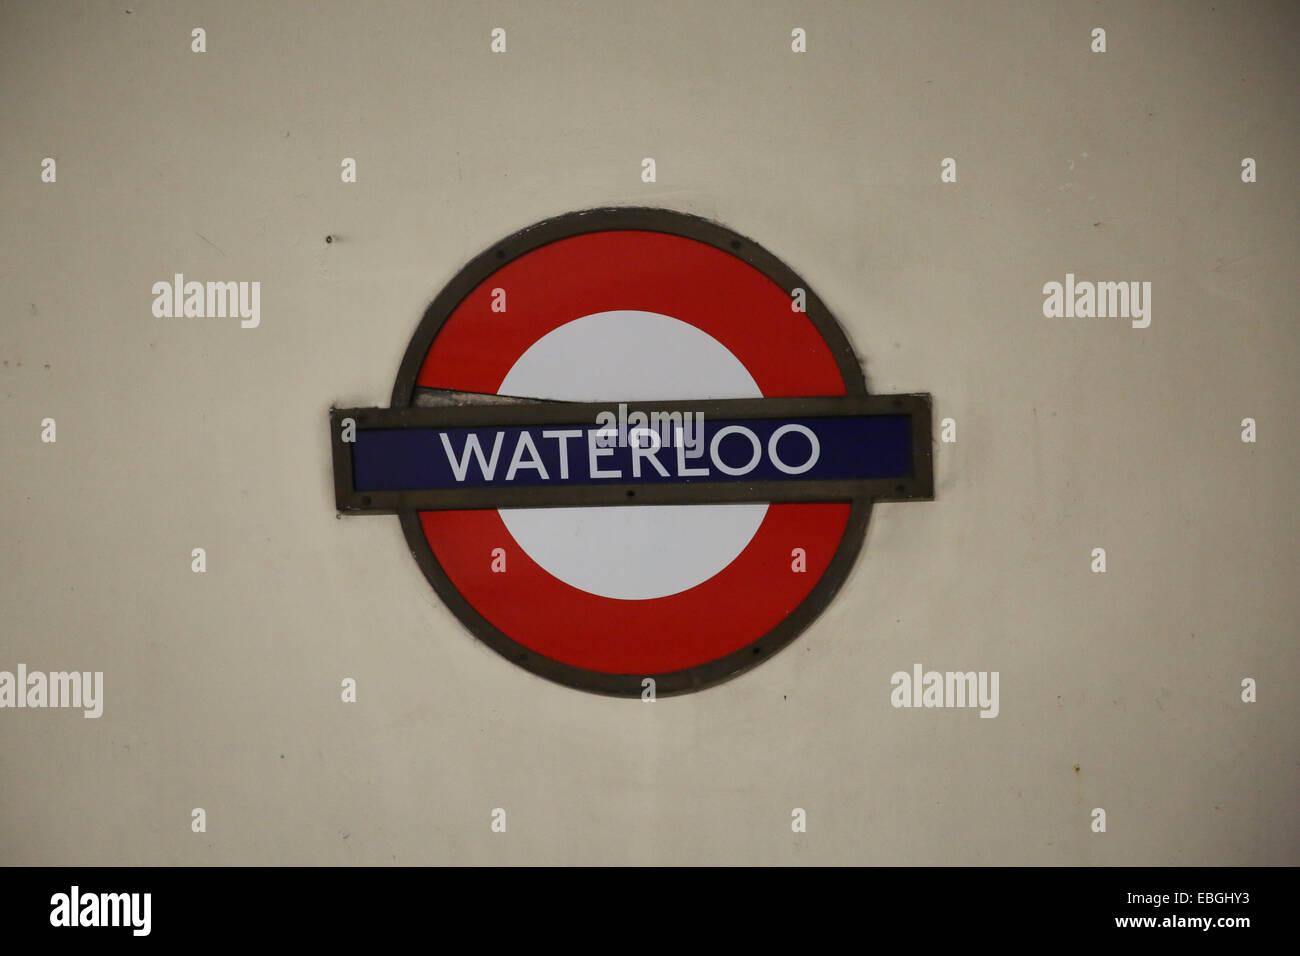 Tfl Underground Sign At Waterloo London Underground Station Stock